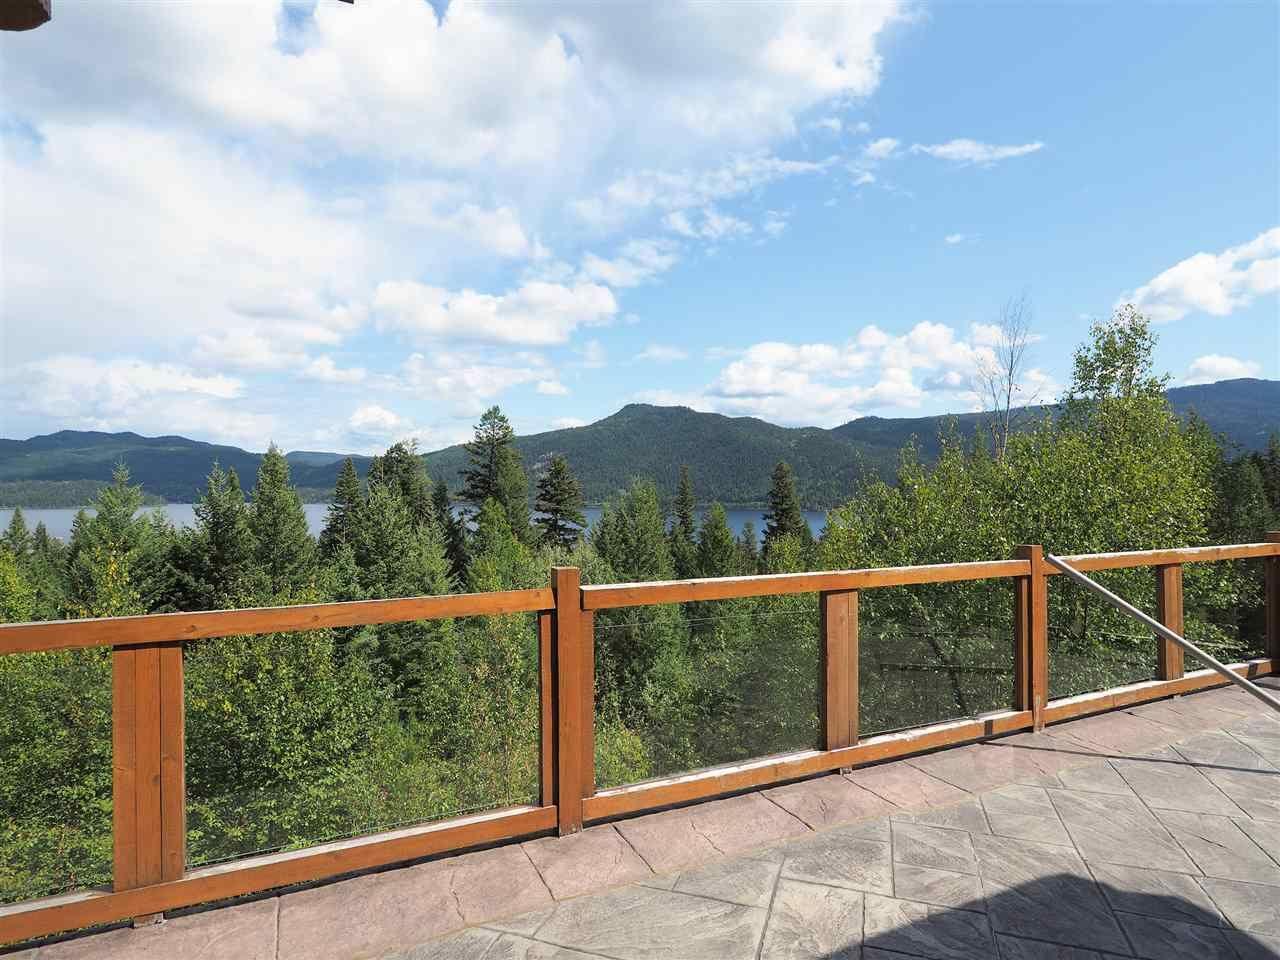 Photo 3: Photos: 4050 CANIM-HENDRIX LAKE Road in Canim Lake: Canim/Mahood Lake House for sale (100 Mile House (Zone 10))  : MLS®# R2396282